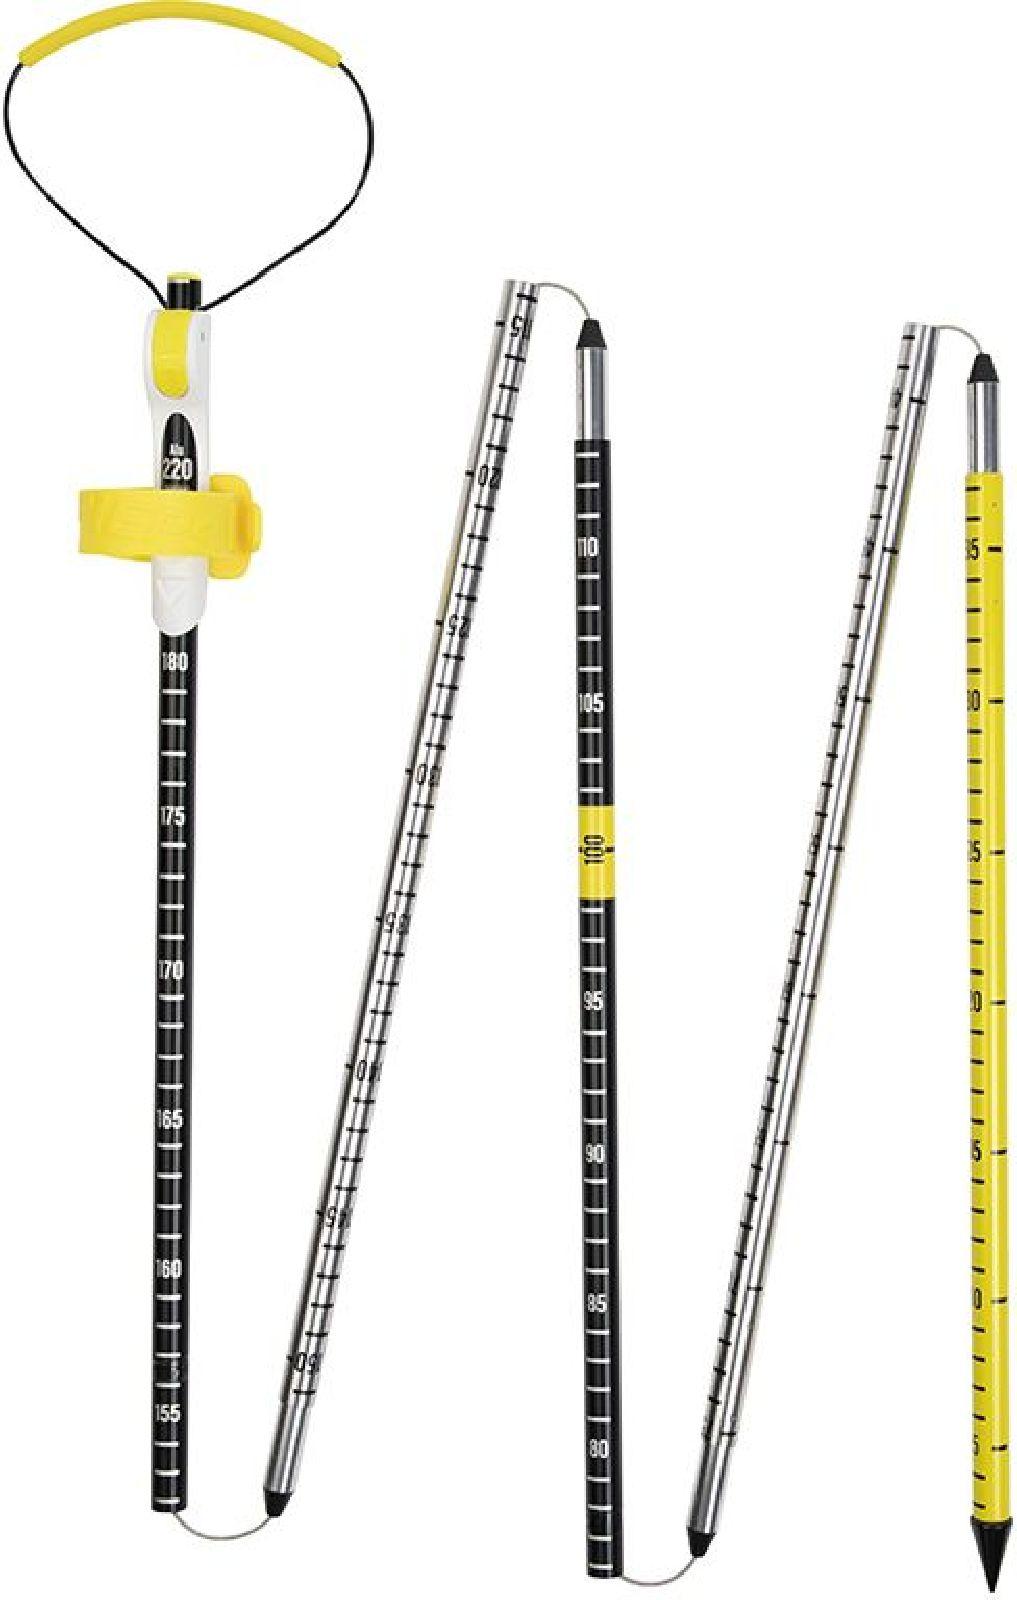 Pieps Probe Alu 220 Sport - black/silver/yellow uni